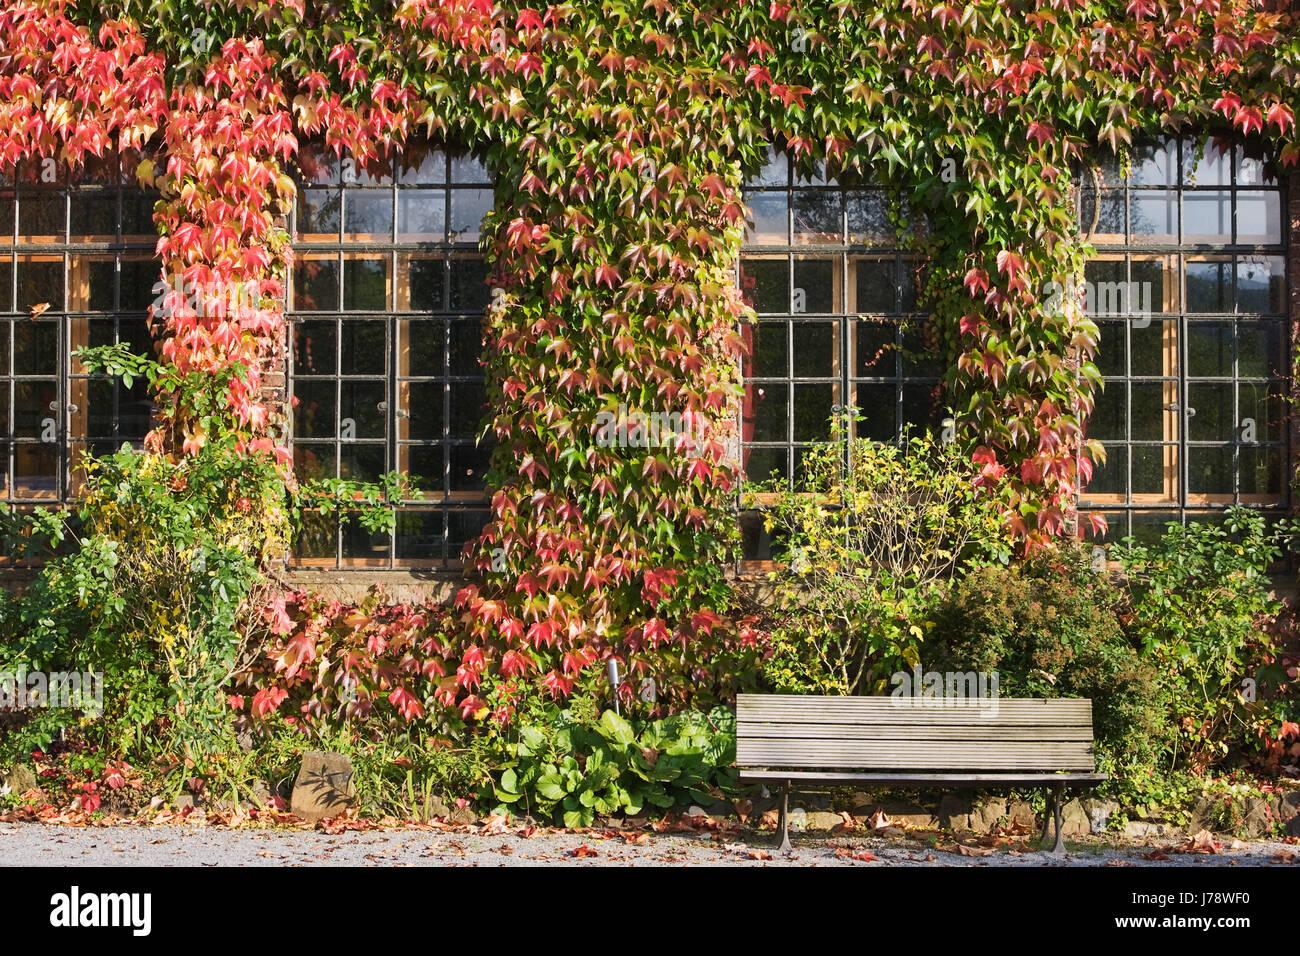 house building window porthole dormer window pane sunlight fiercer vine grape Stock Photo